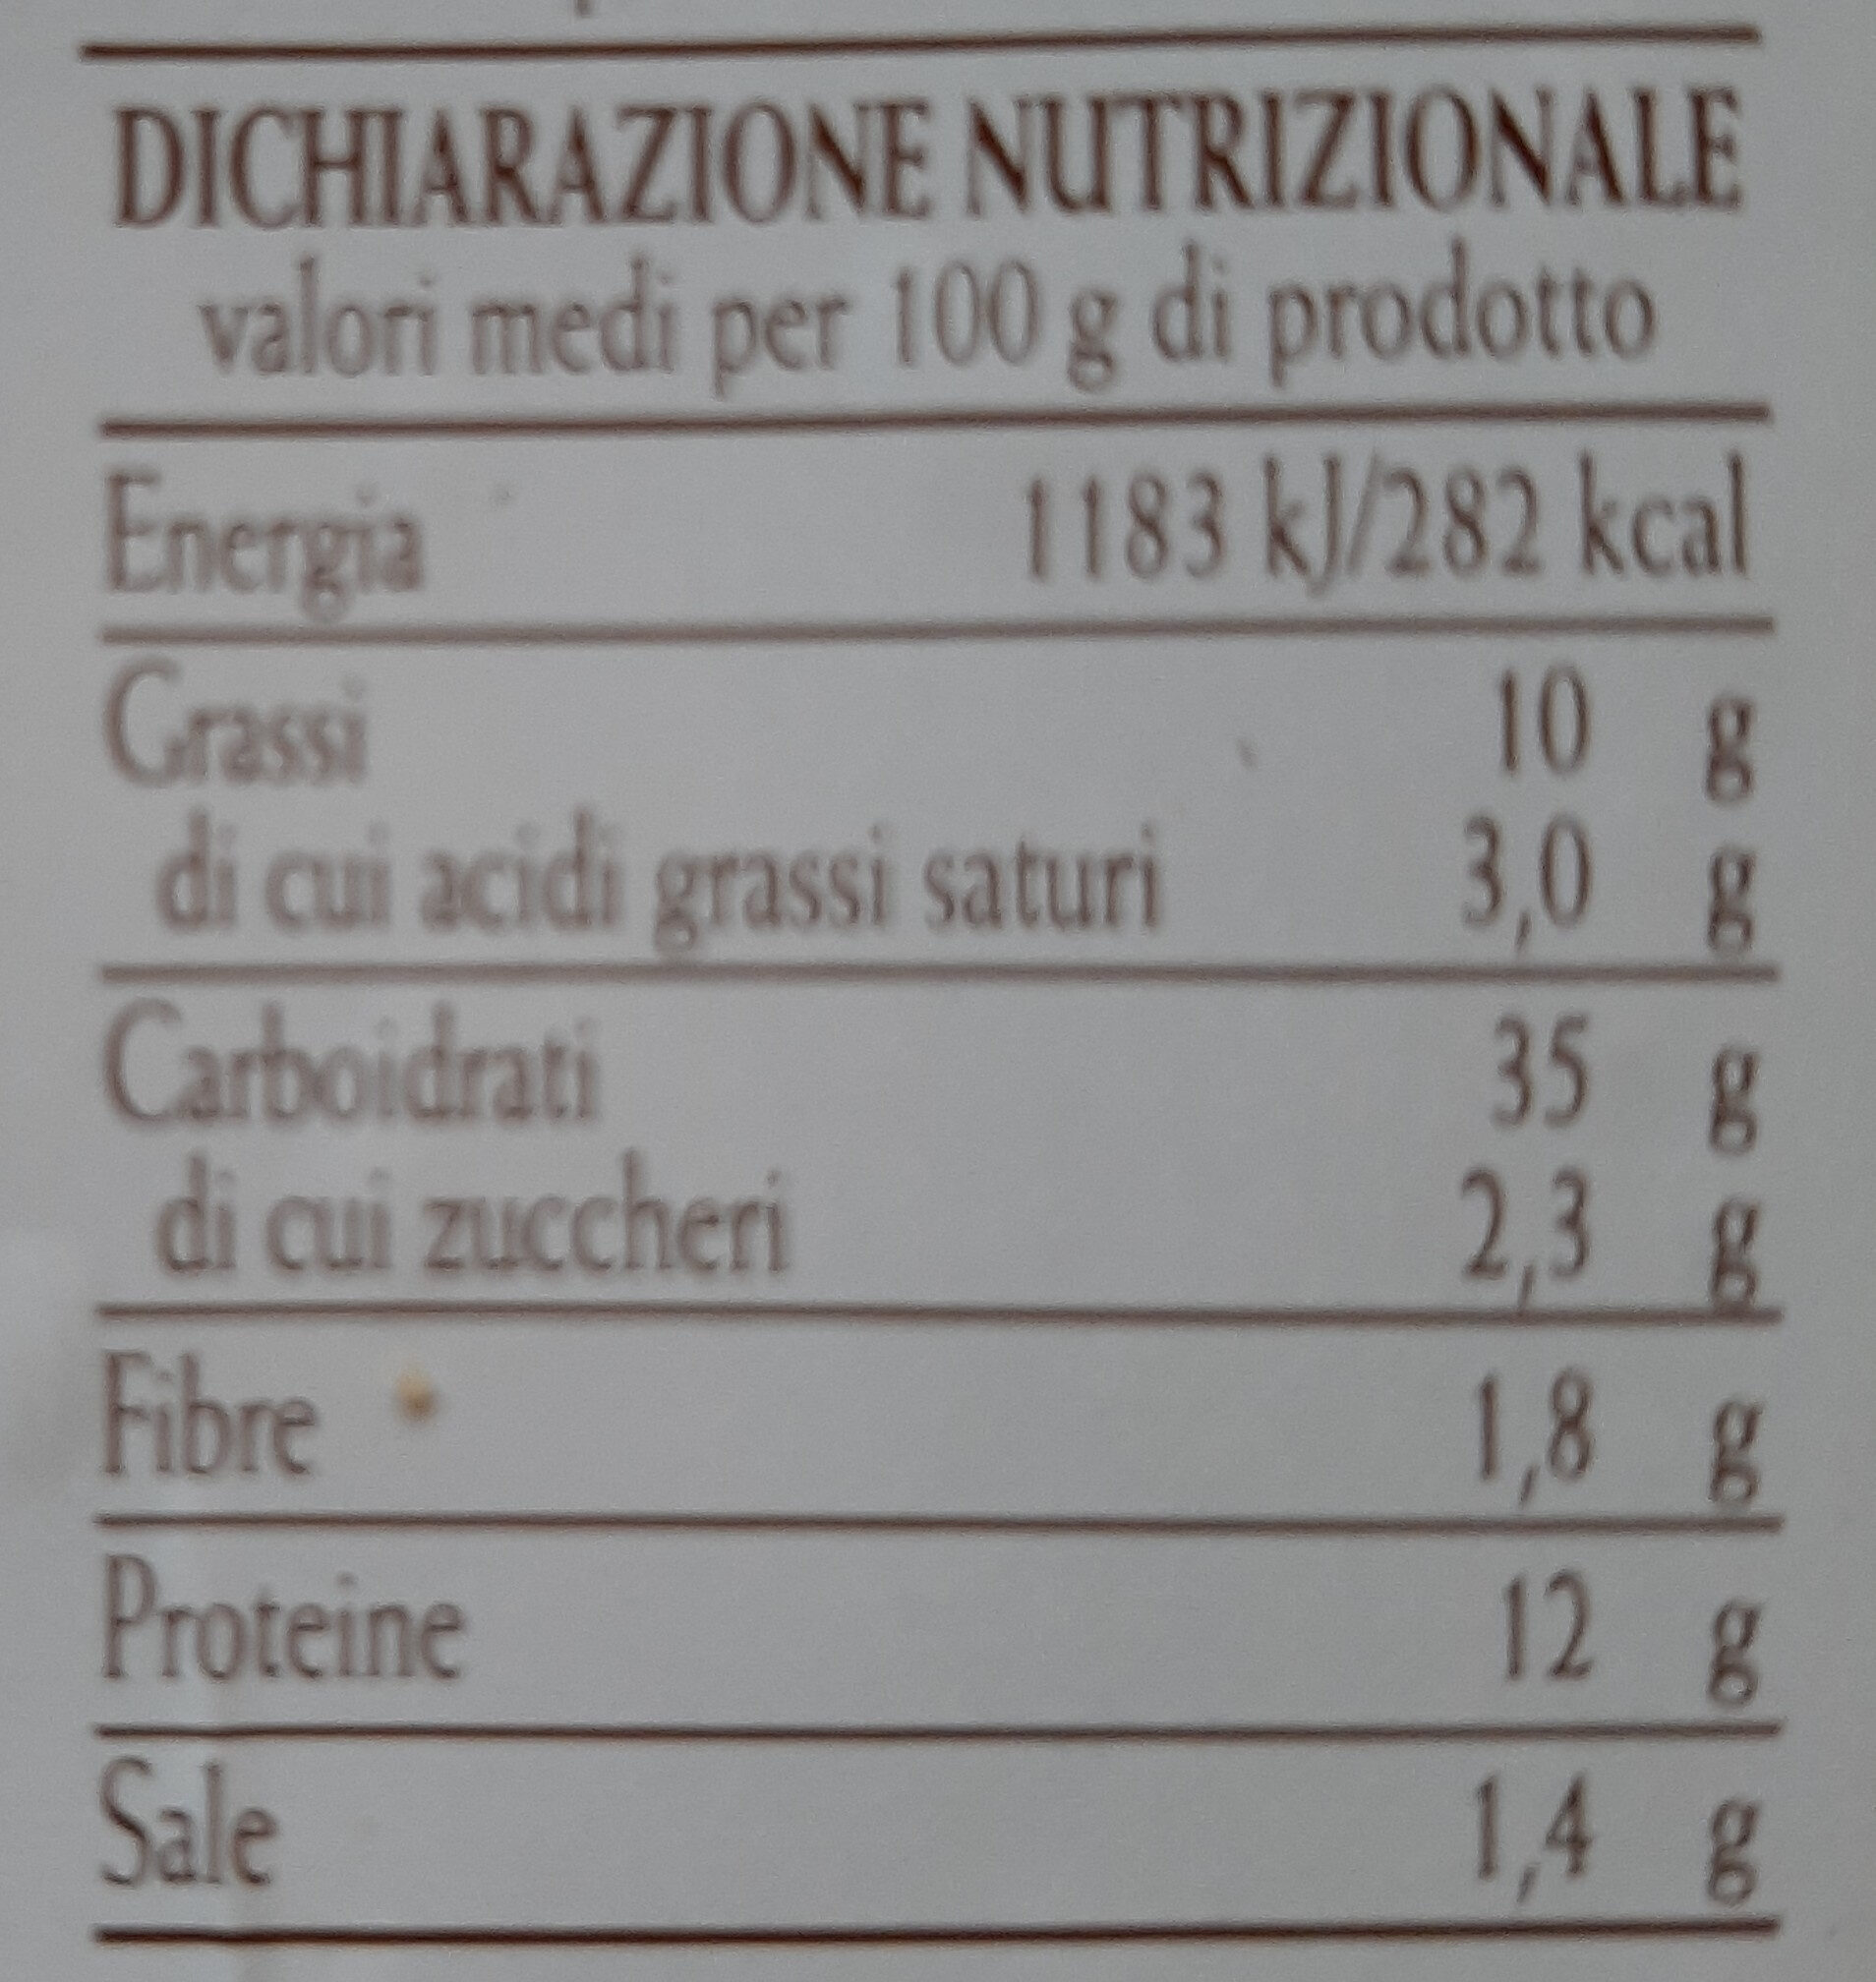 Ravioli alla borragine - Informations nutritionnelles - it